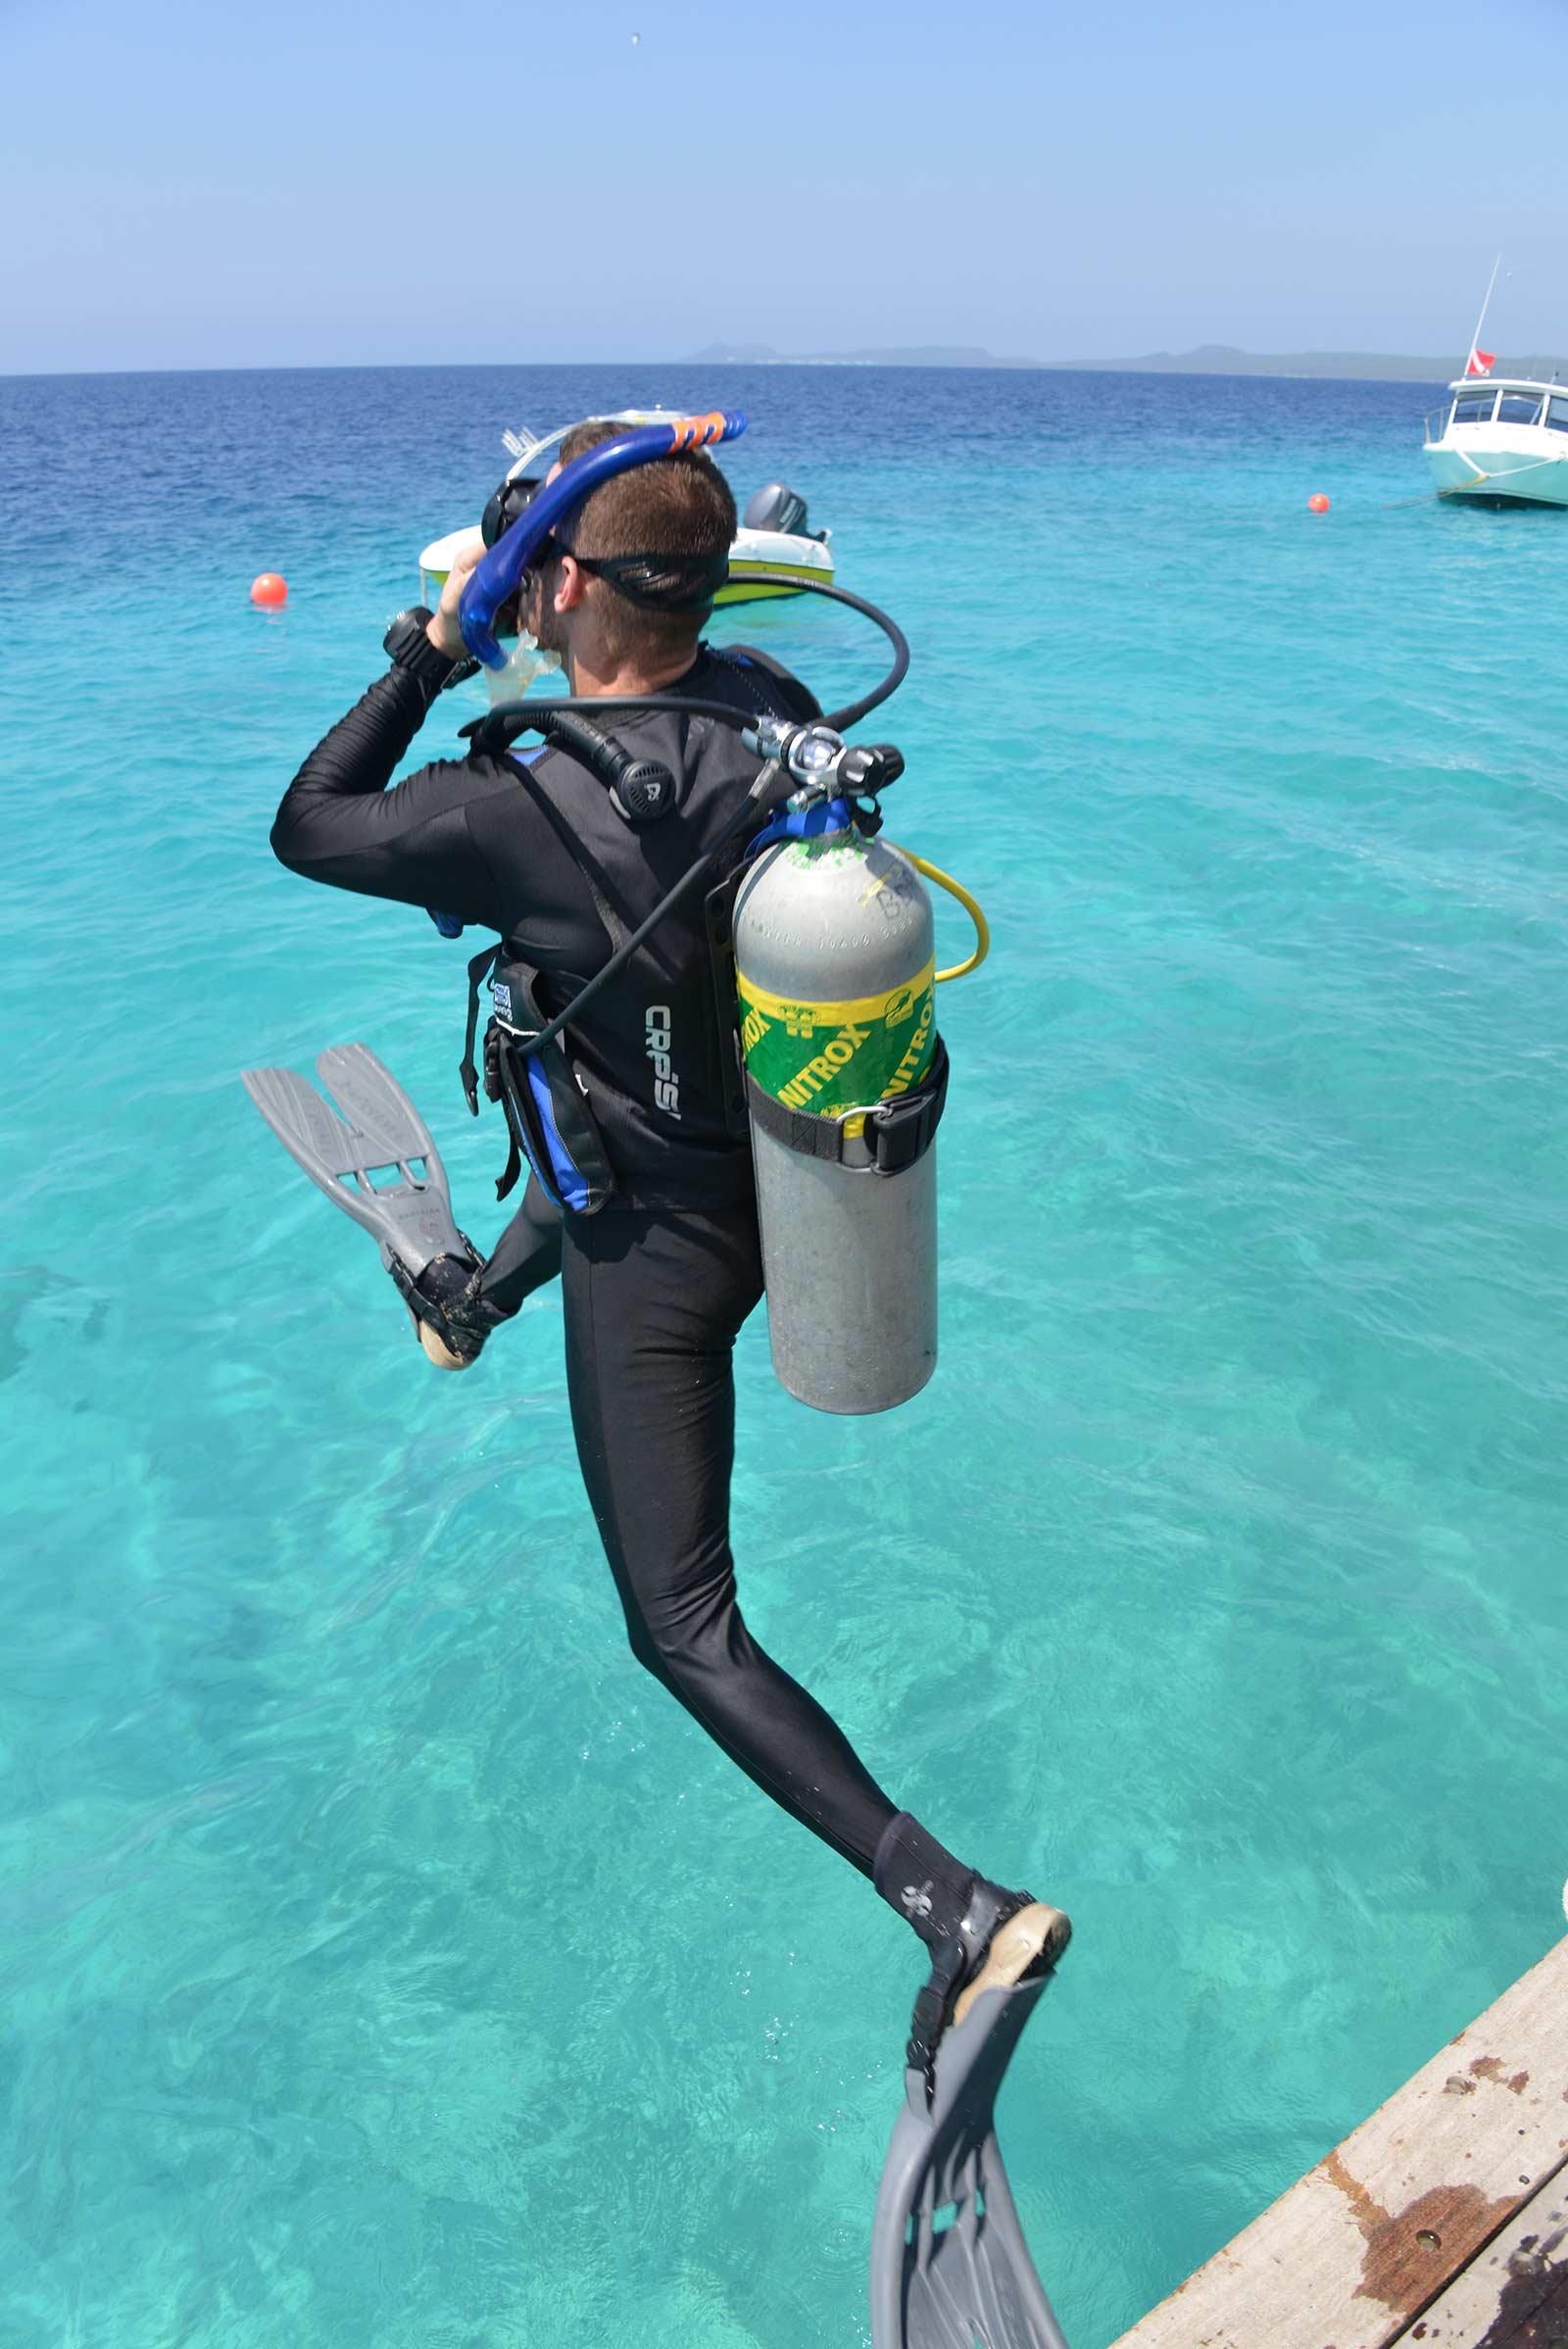 Sdi computer nitrox diver dynamite divers - Nitrox dive computer ...